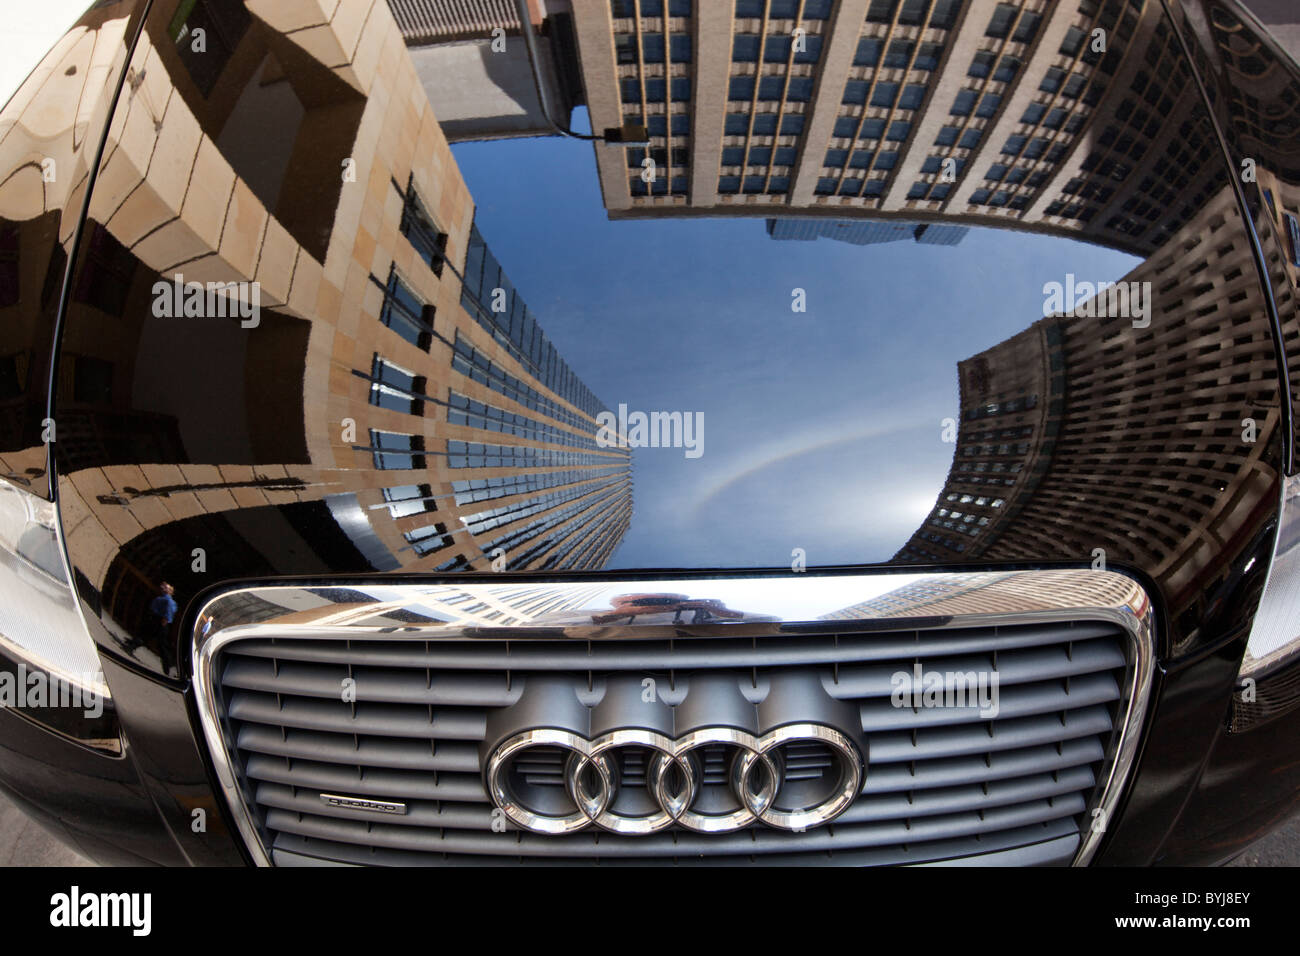 USA, Minnesota, Minneapolis, Reflection of office building in Audi car's hood Stock Photo